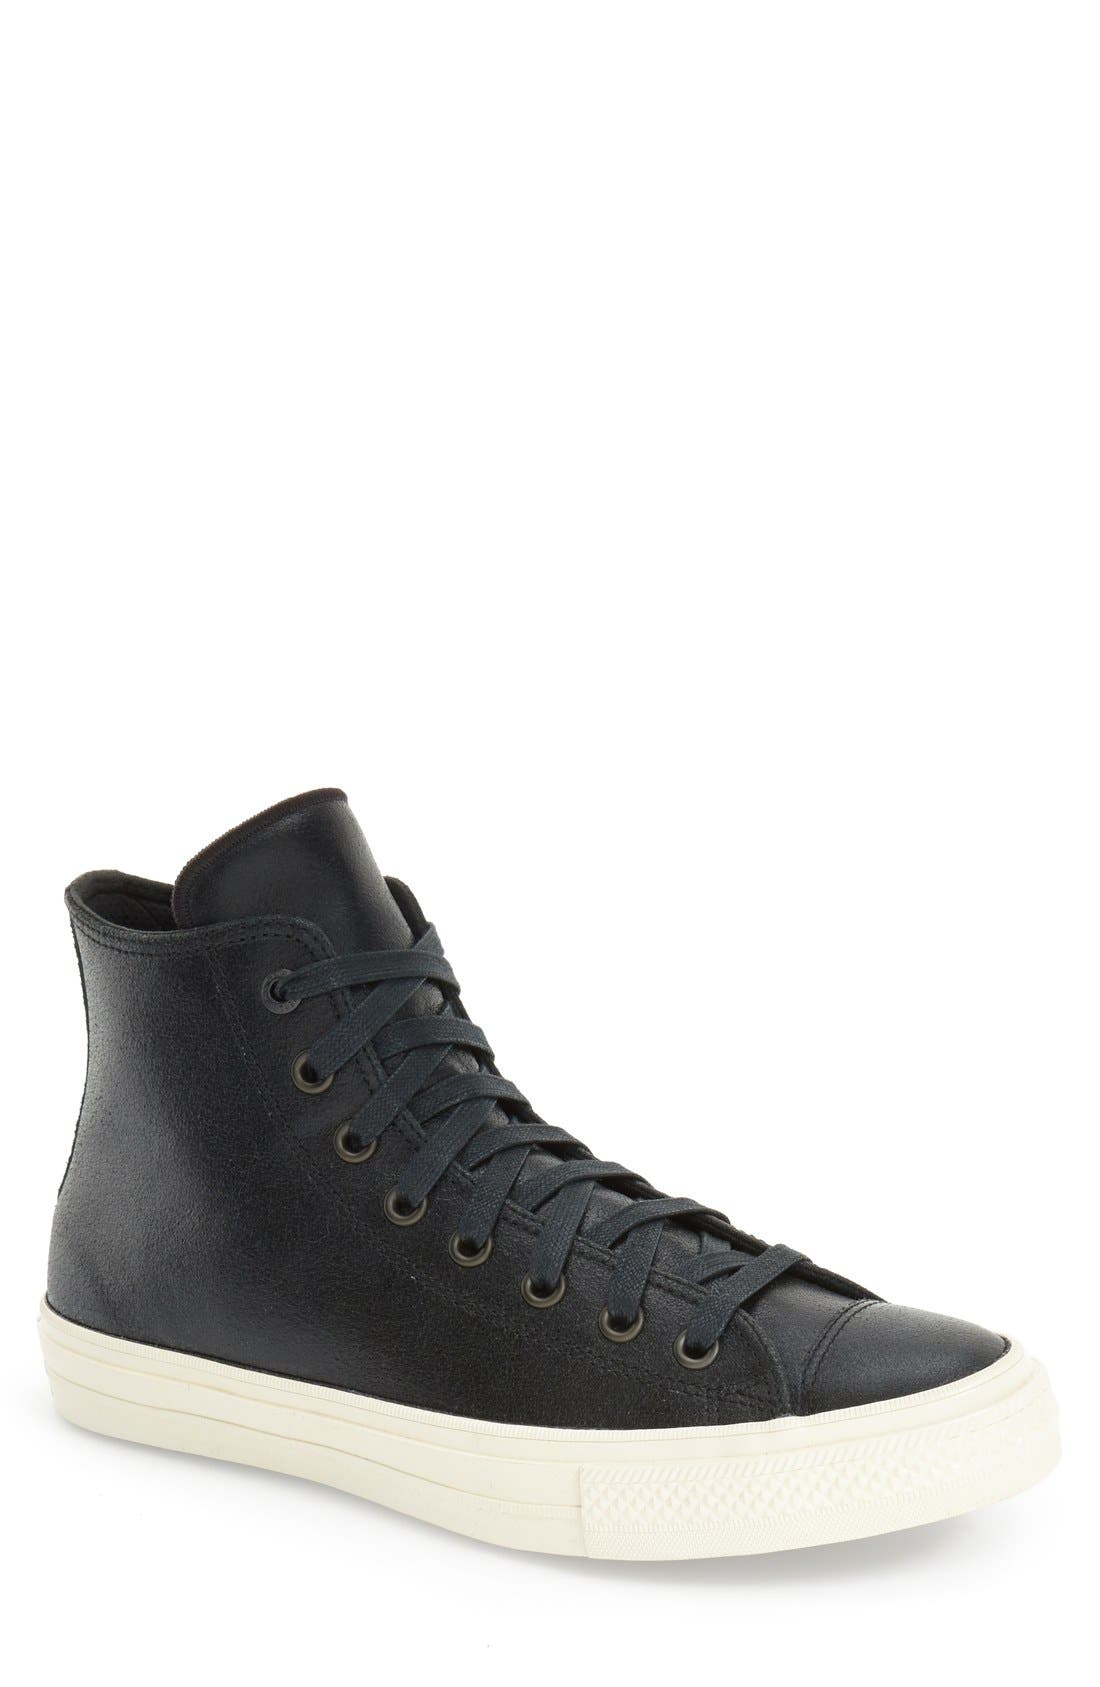 'Chuck II' High Top Sneaker,                             Main thumbnail 1, color,                             003